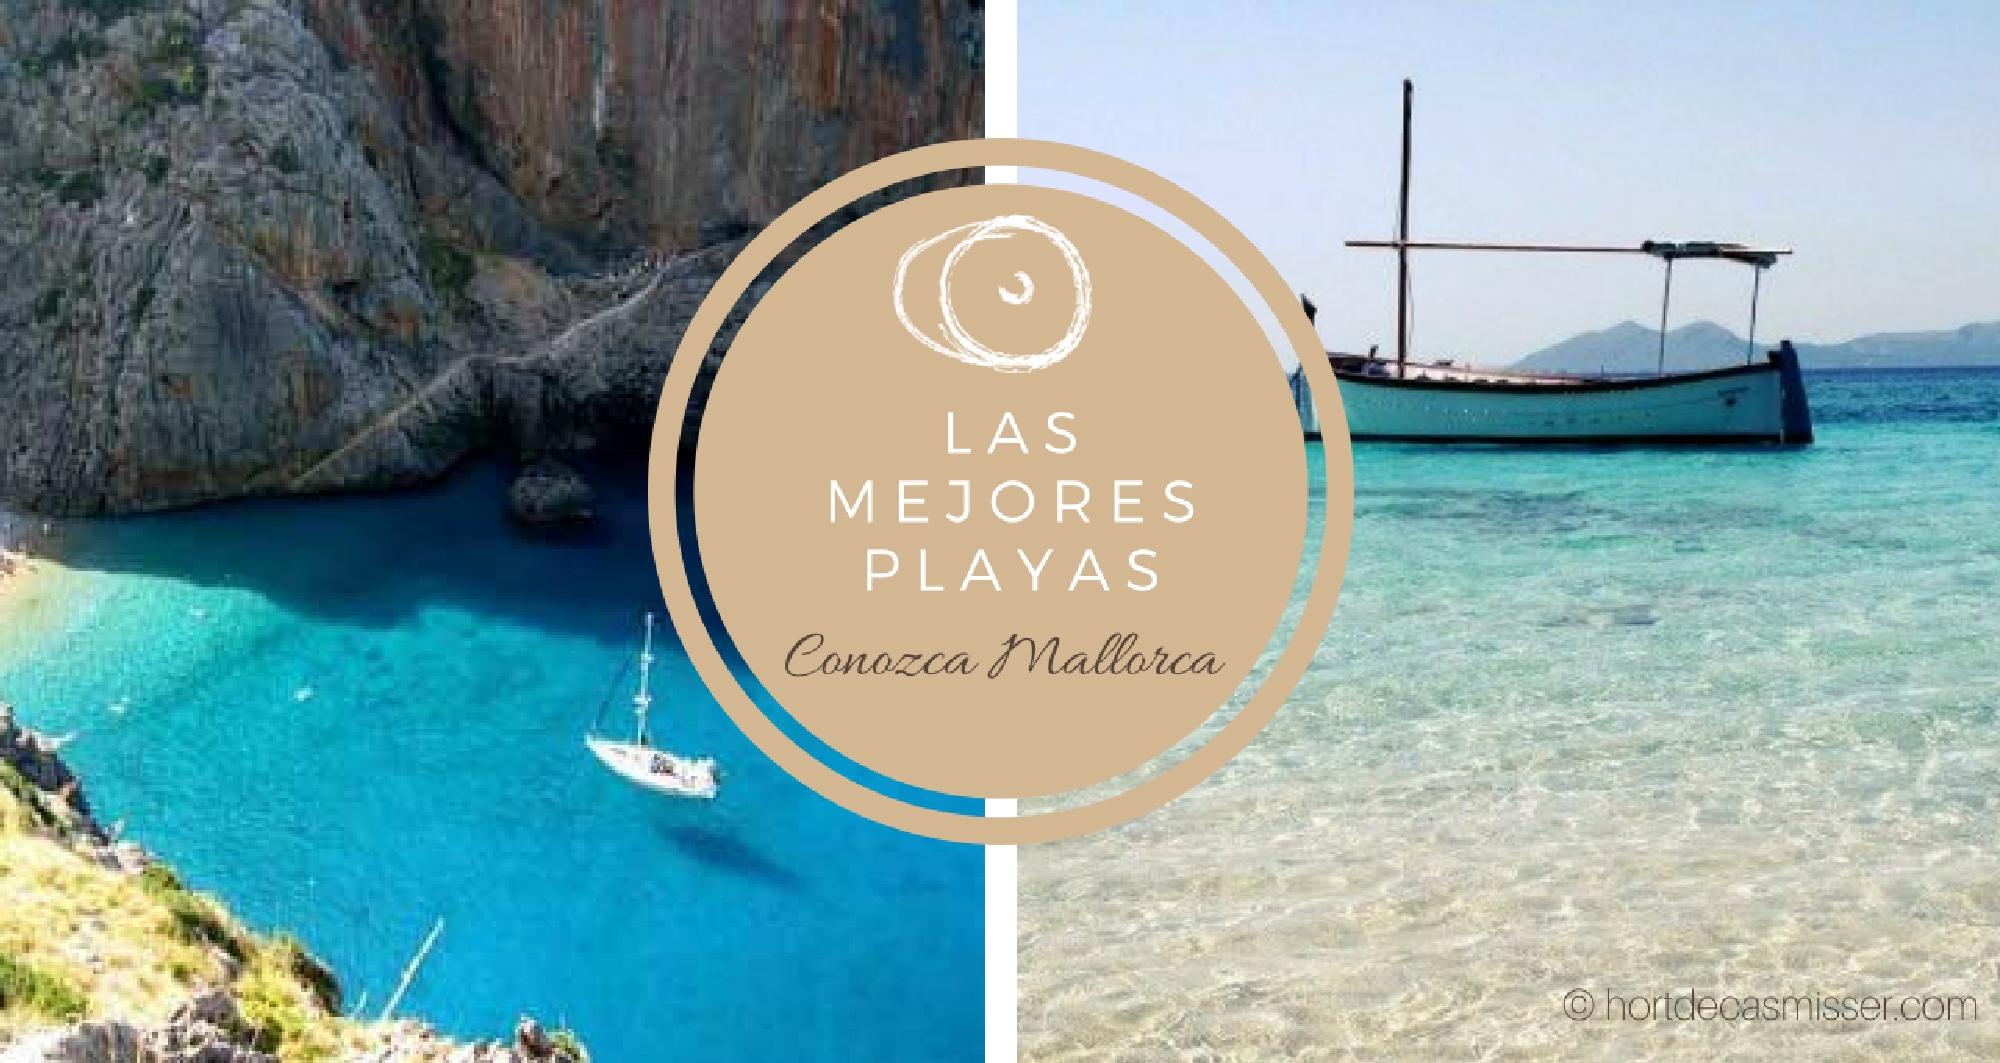 log - las mejores playas Mallorca hortdecasmisser